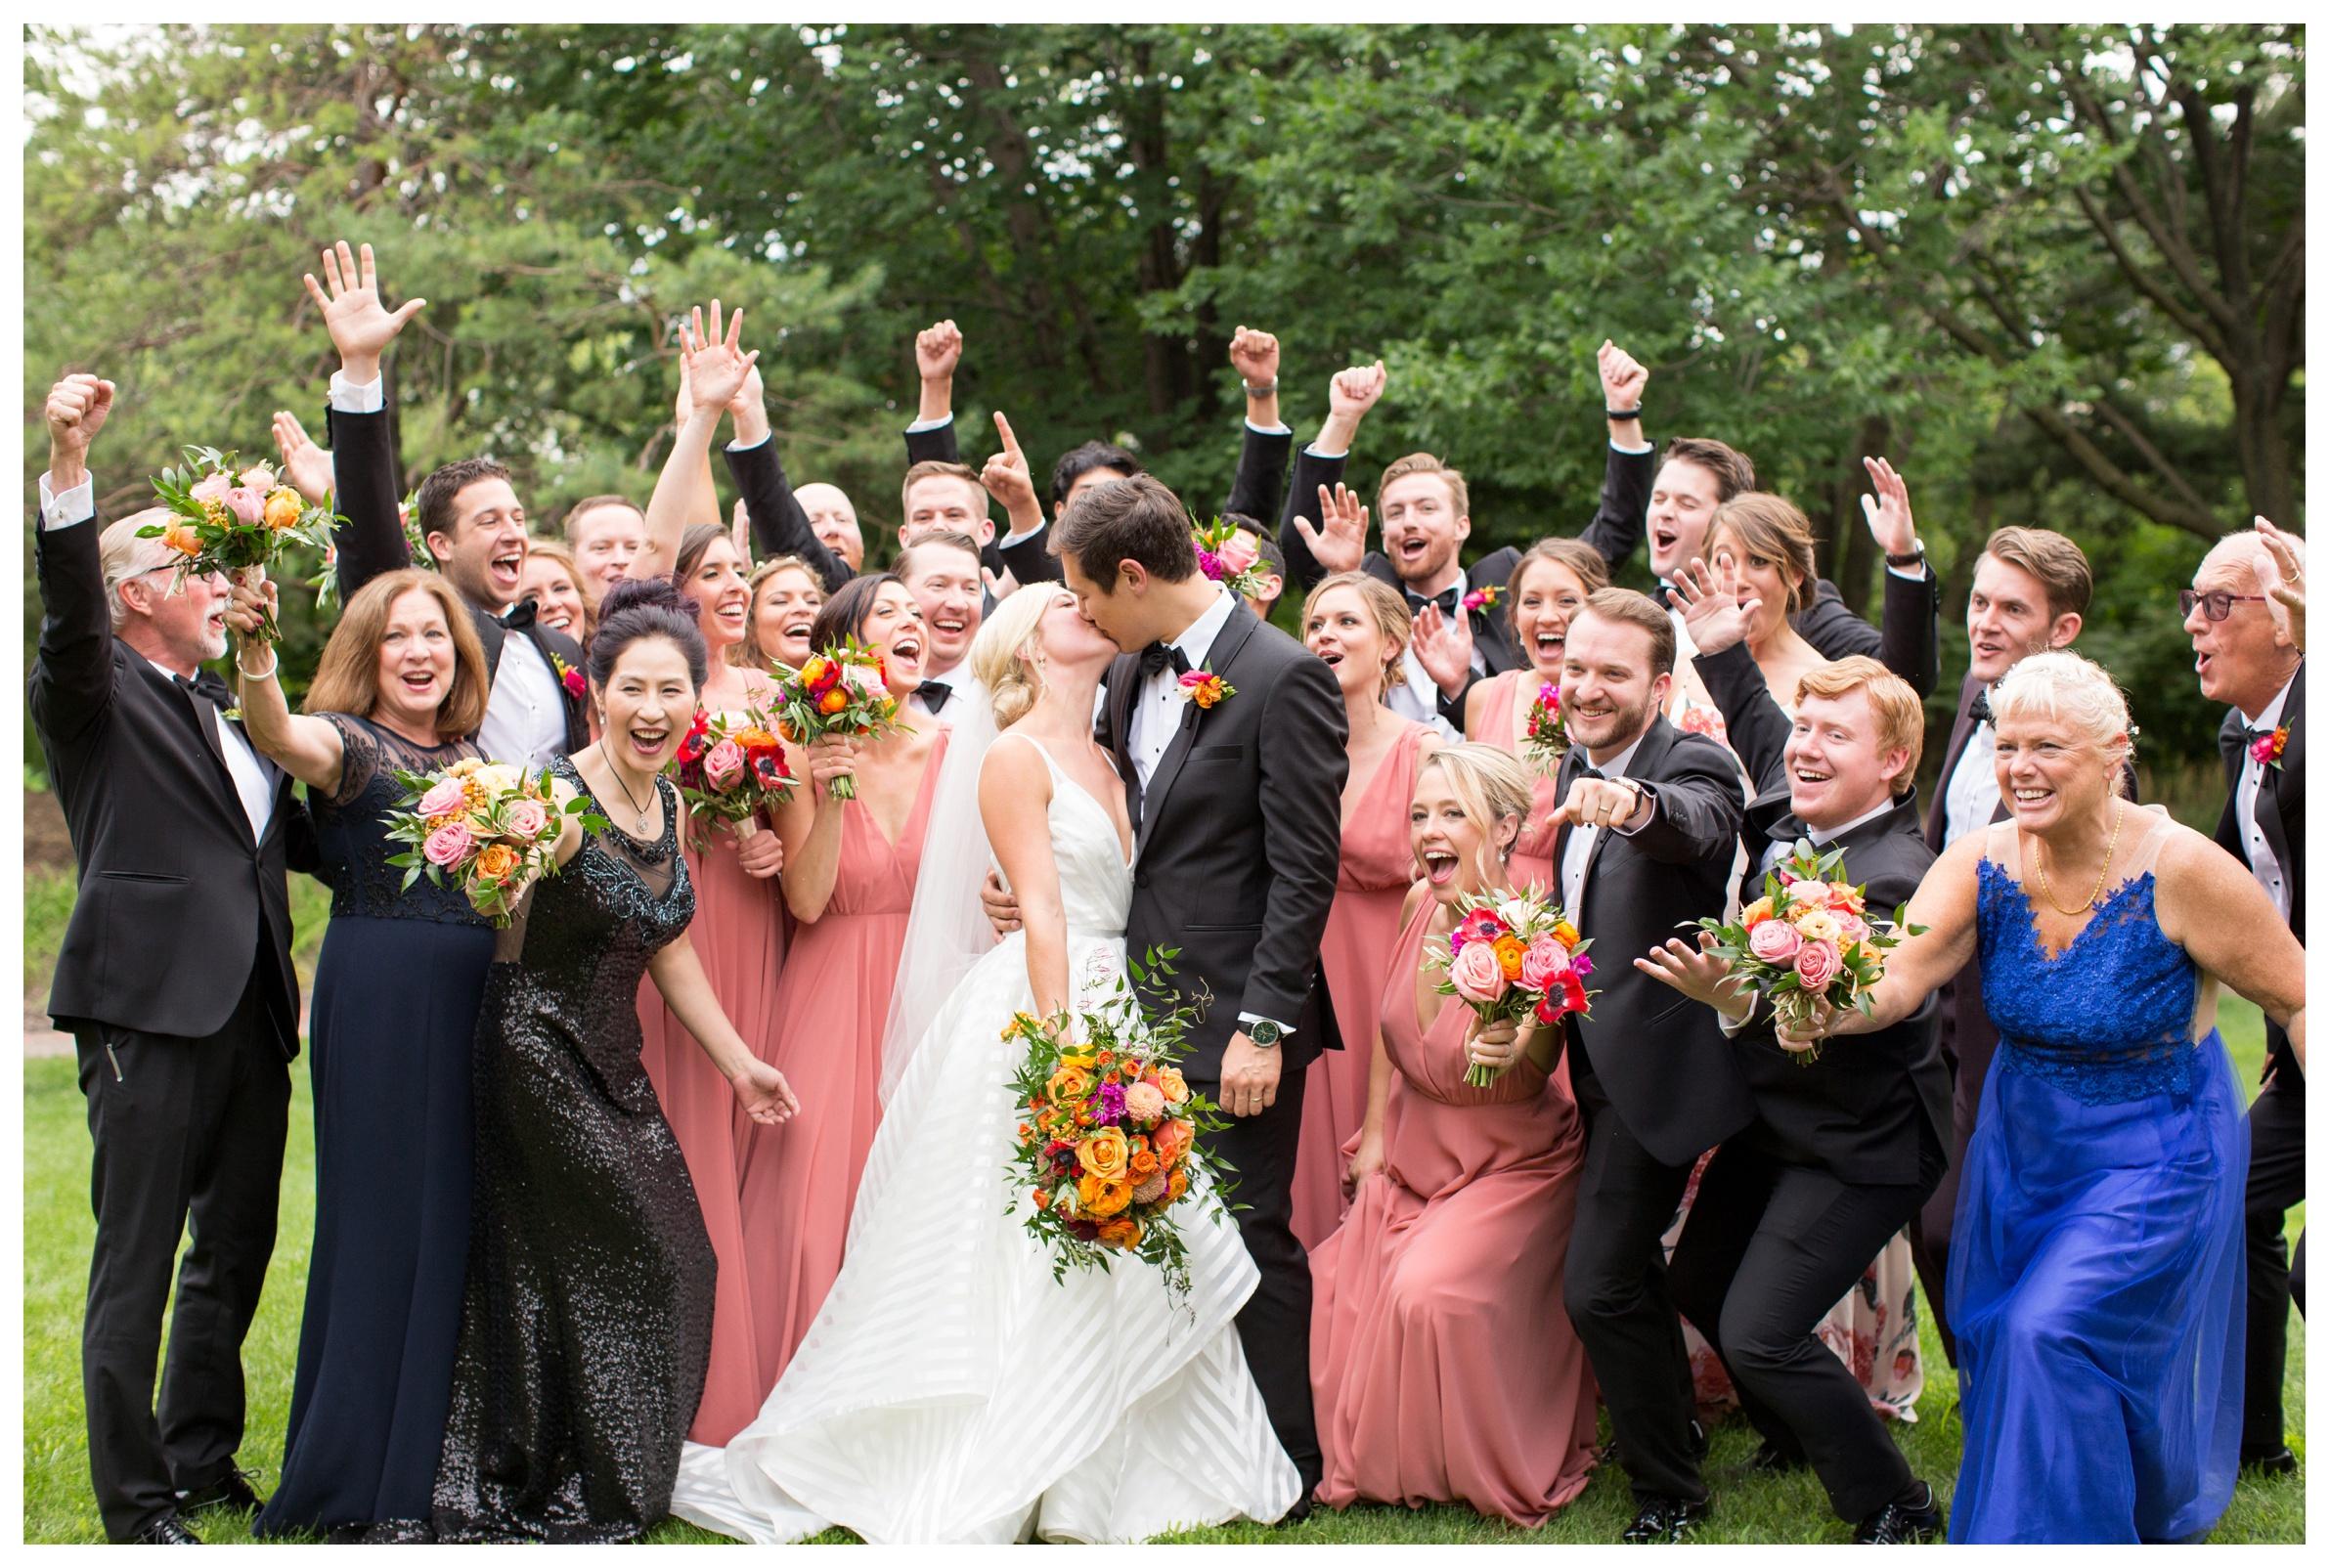 bridgeport-art-center-wedding-ceremony